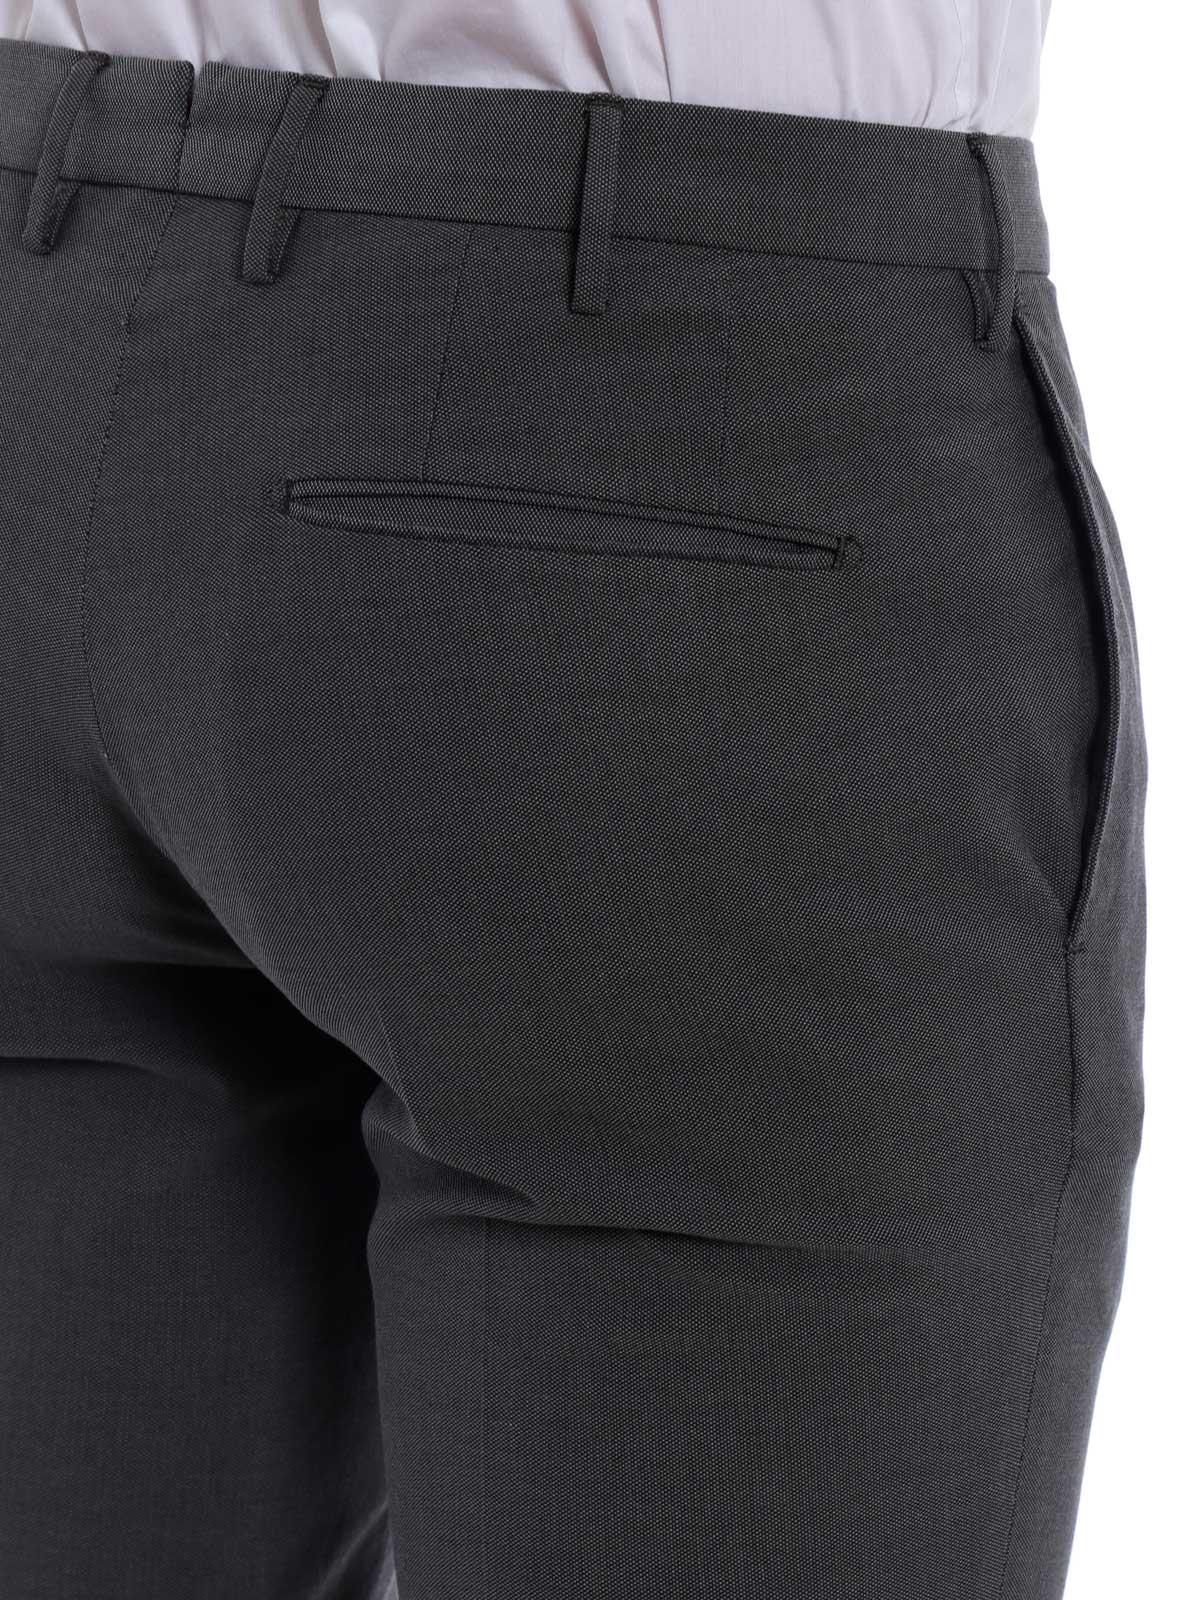 Picture of INCOTEX   Men's Cotton Jacquard Trousers